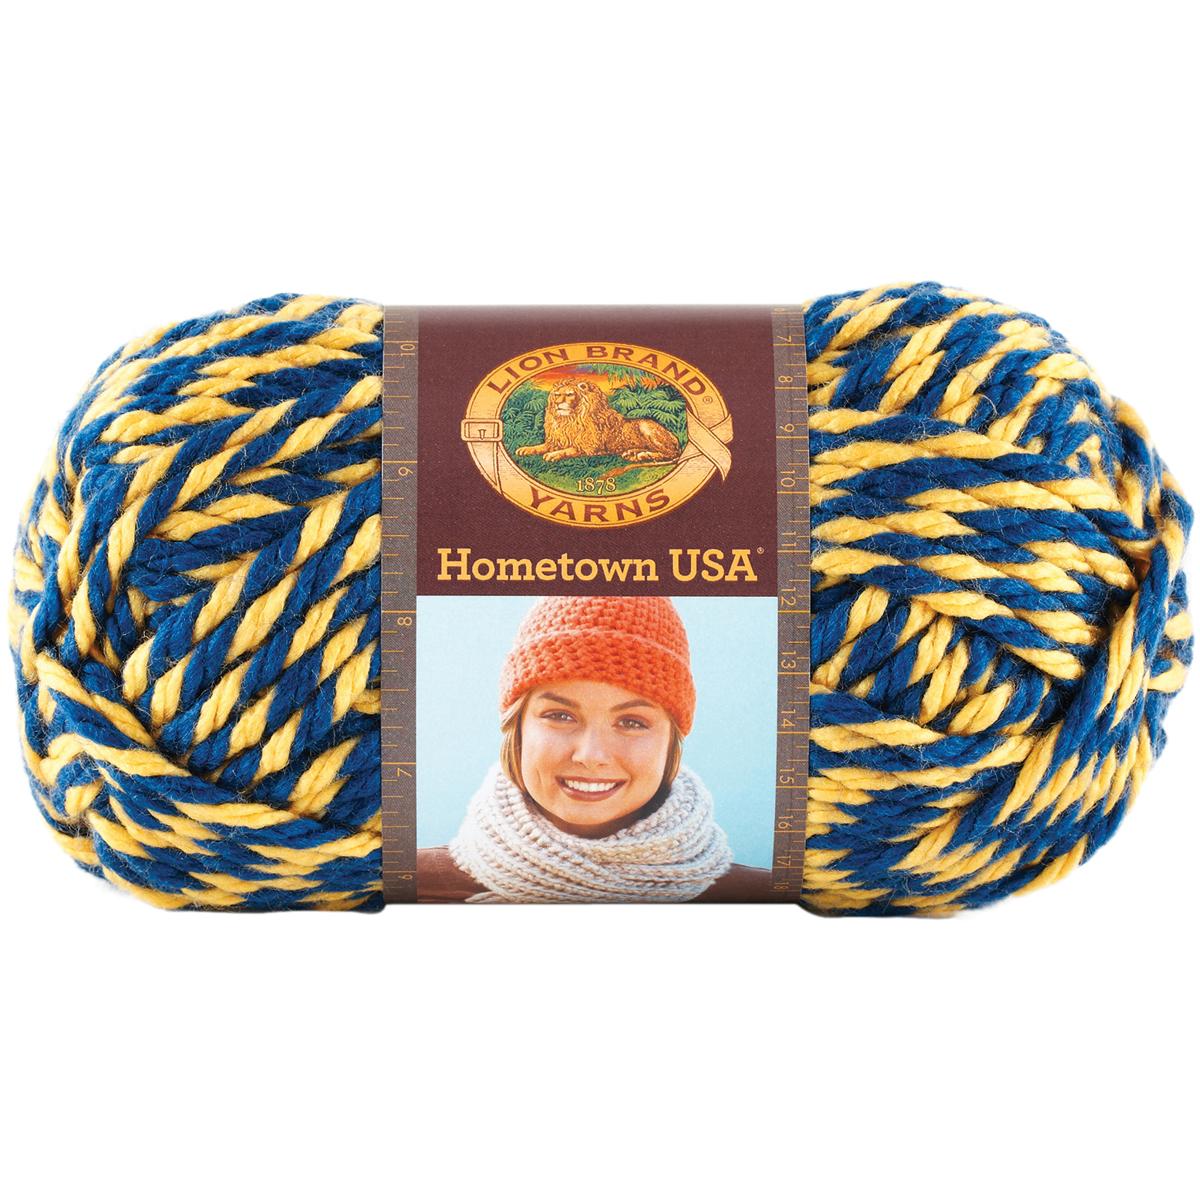 Lion Brand Yarn 135-610 Hometown USA Yarn, Wolverines Multi-Colored